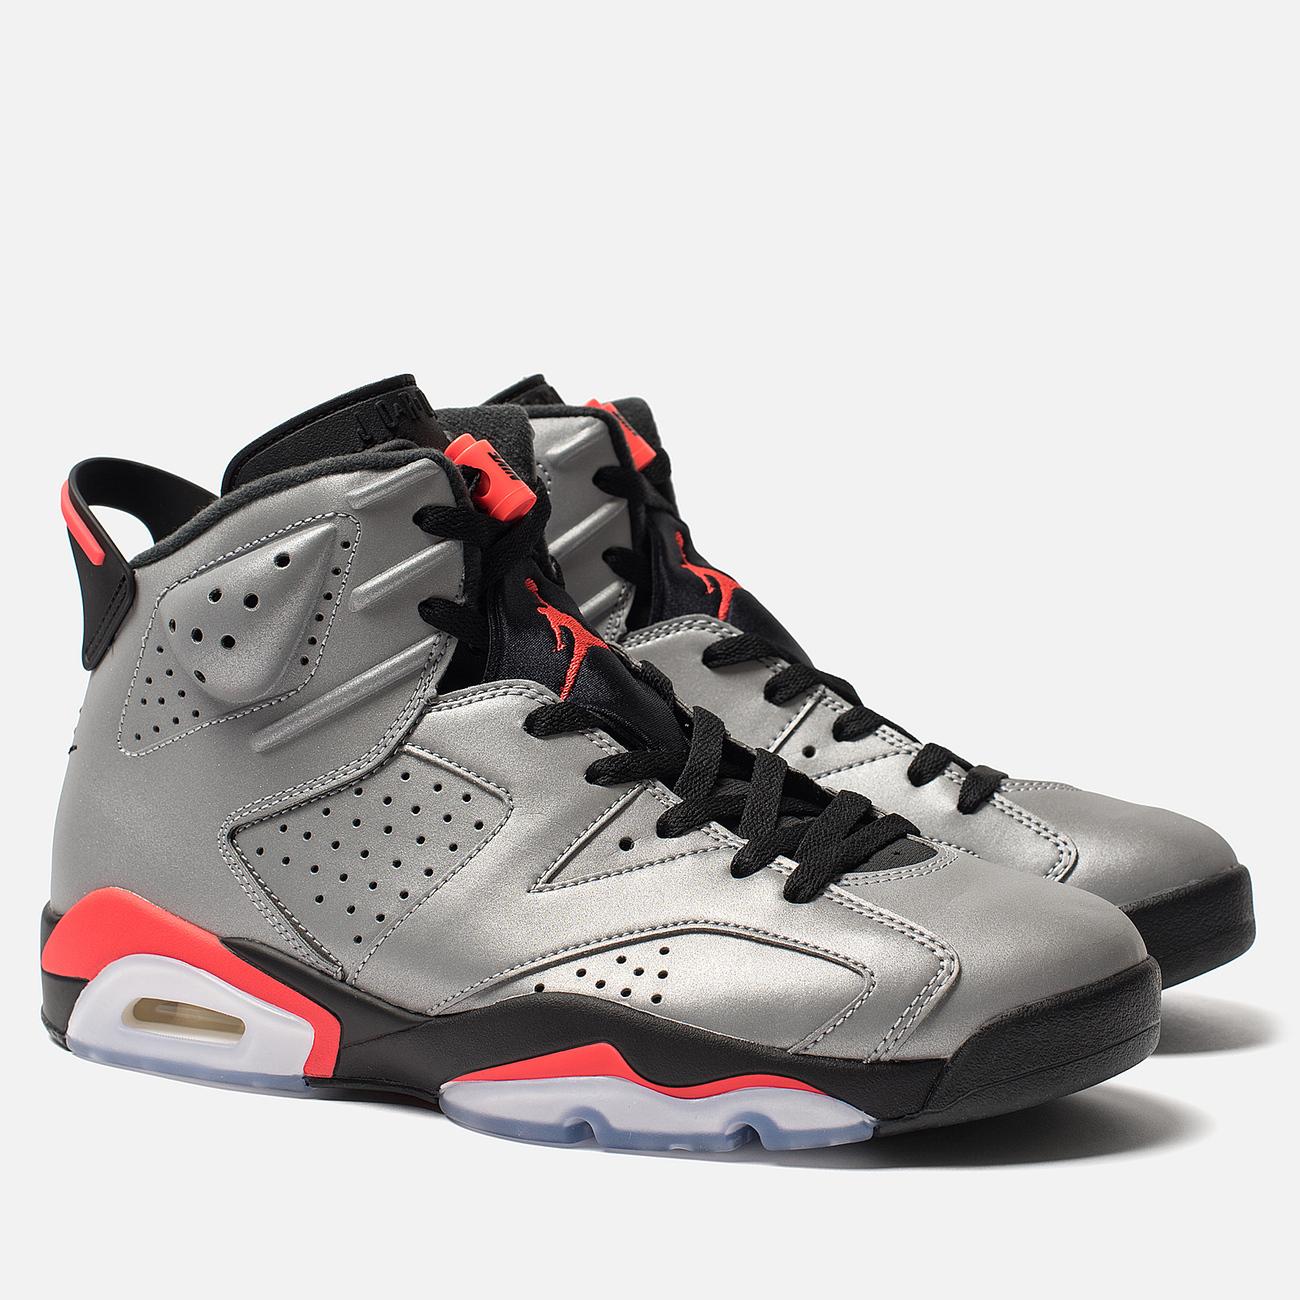 Мужские кроссовки Jordan Air Jordan 6 Retro SP Reflect Silver/Infrared/Black